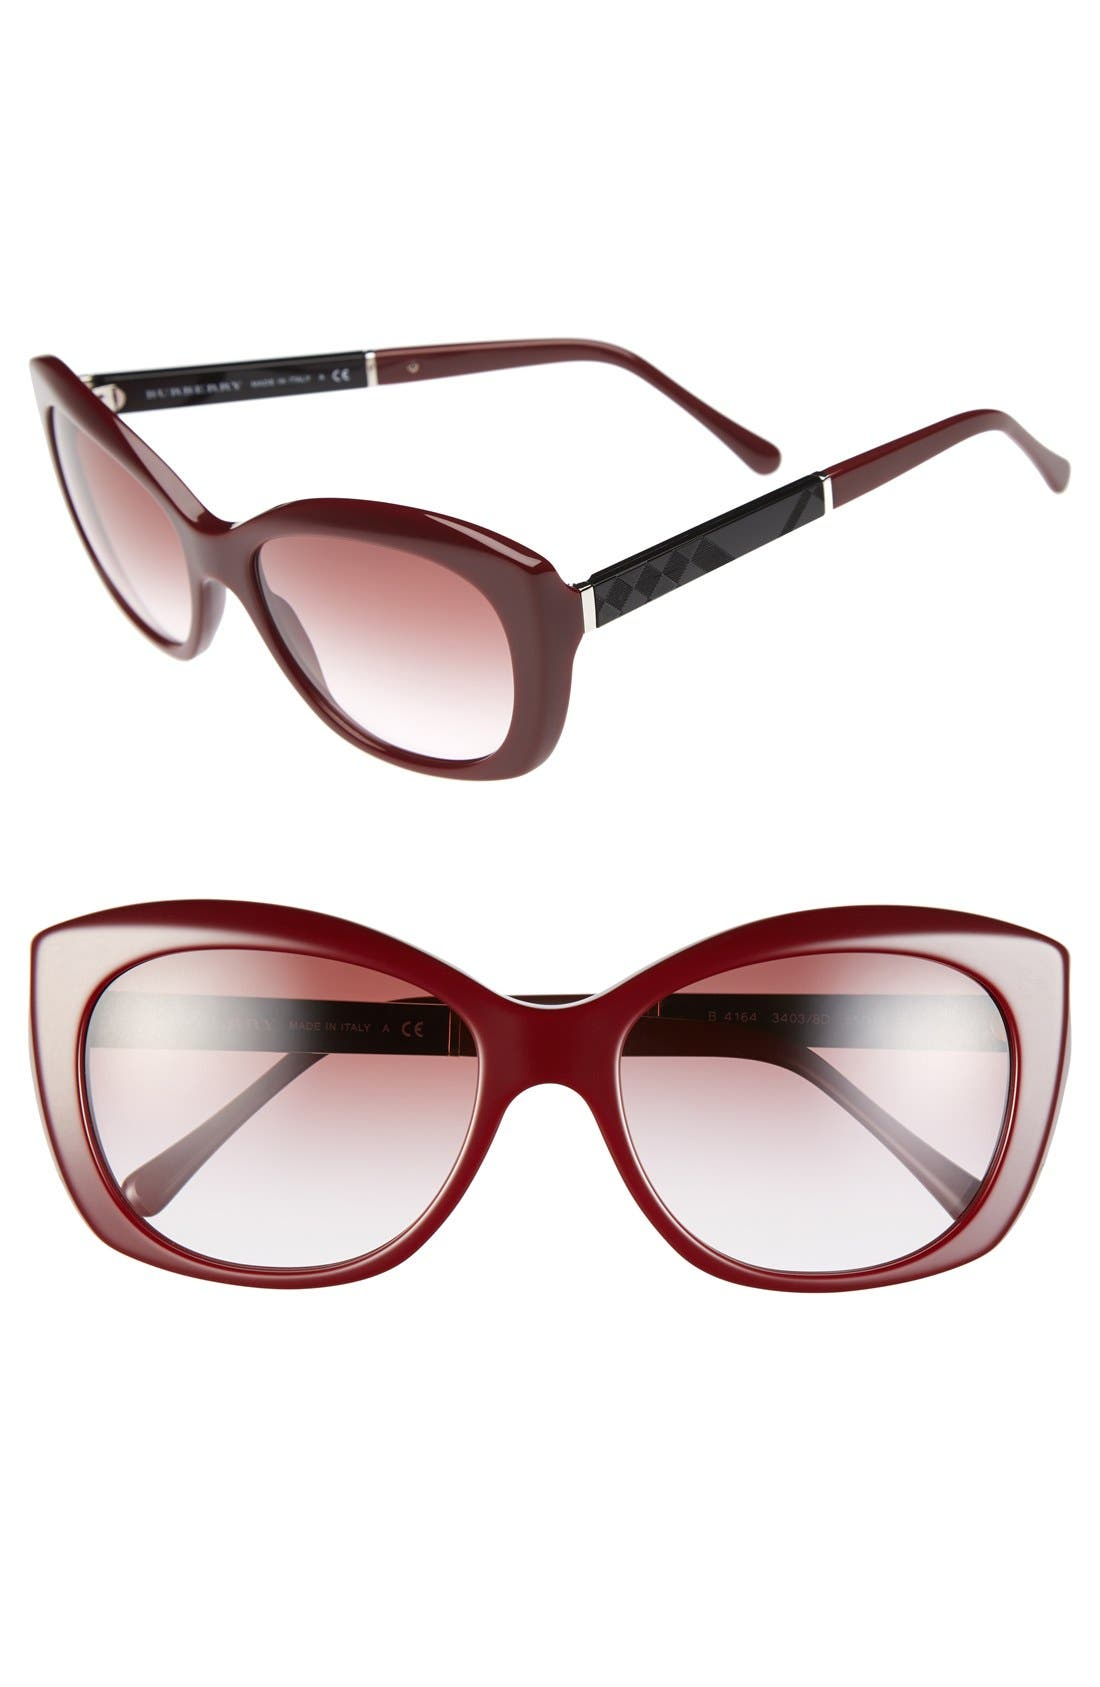 Main Image - Burberry 55mm Sunglasses